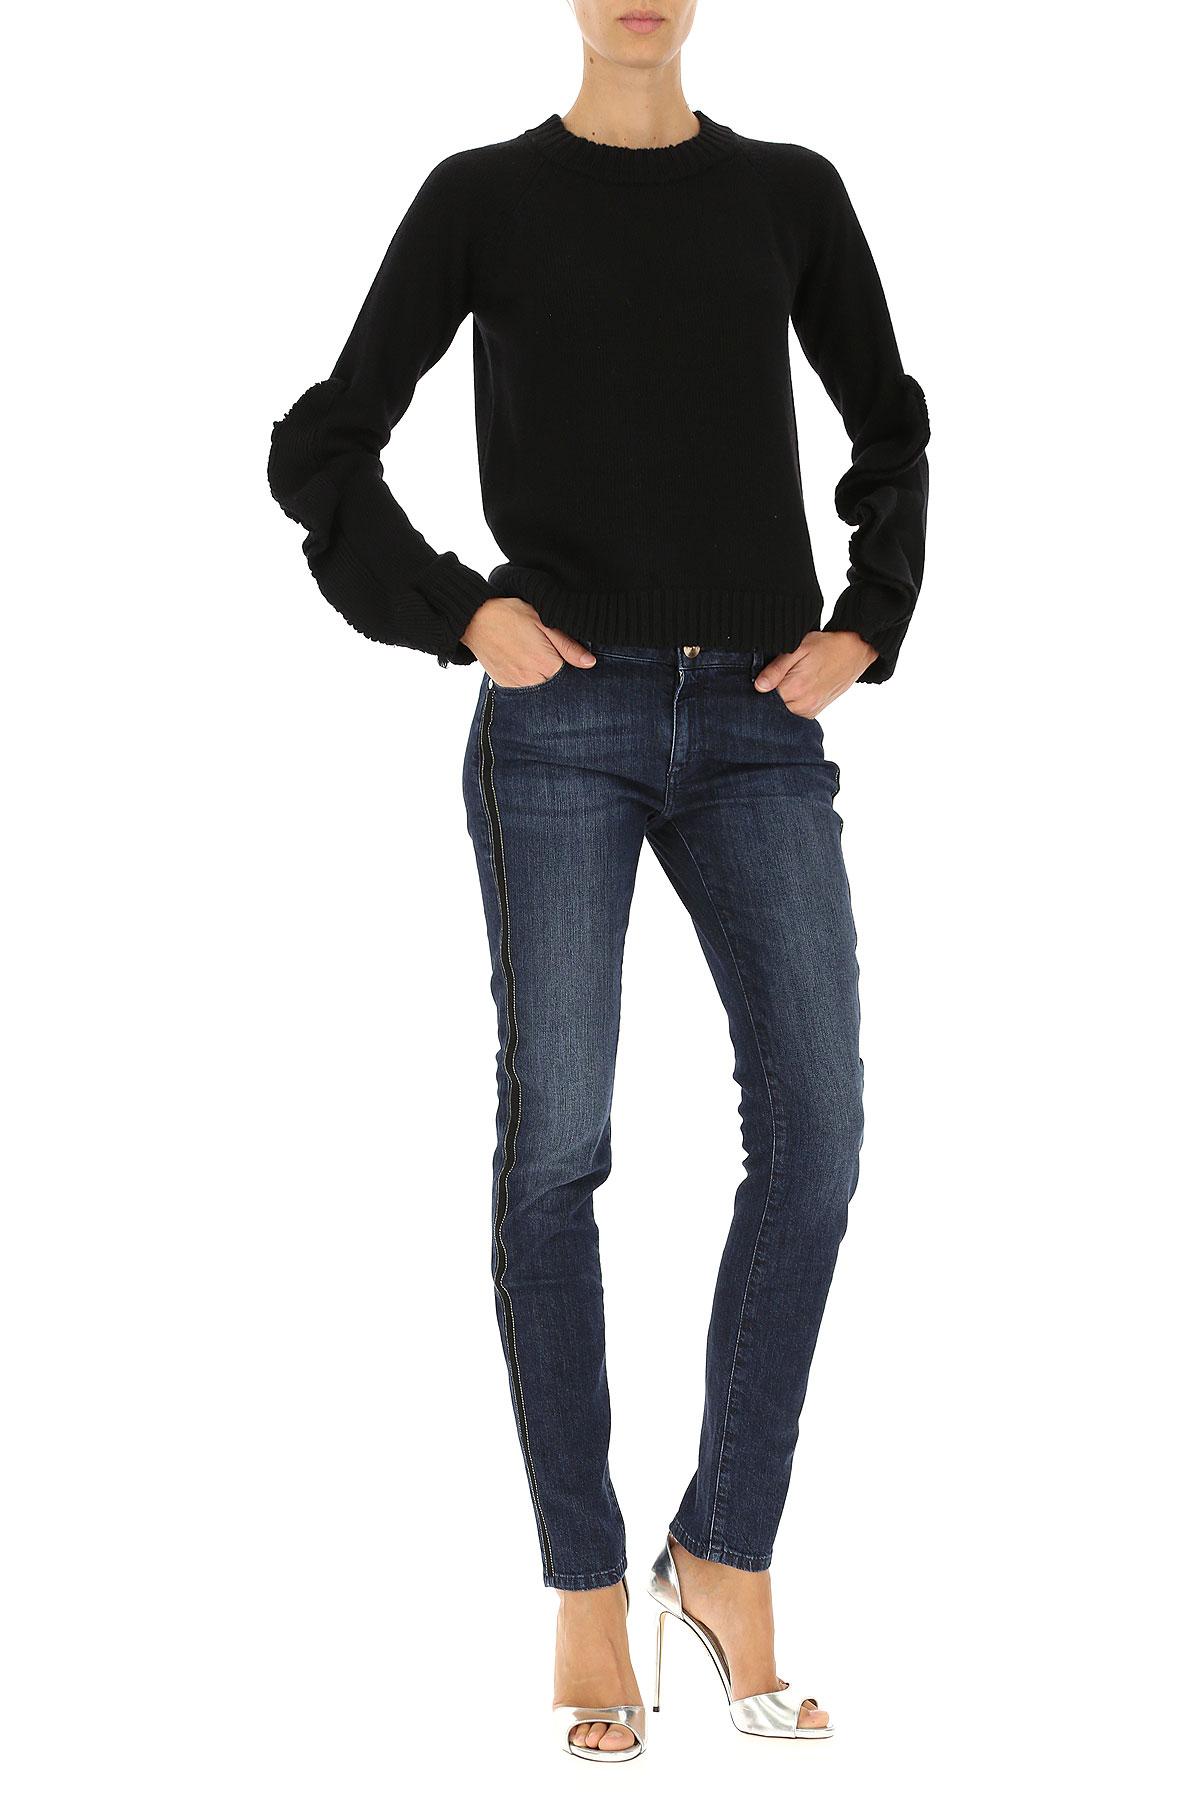 Image of Trussardi Jeans, Dark Blue, Cotton, 2017, 26 27 28 30 31 32 33 34